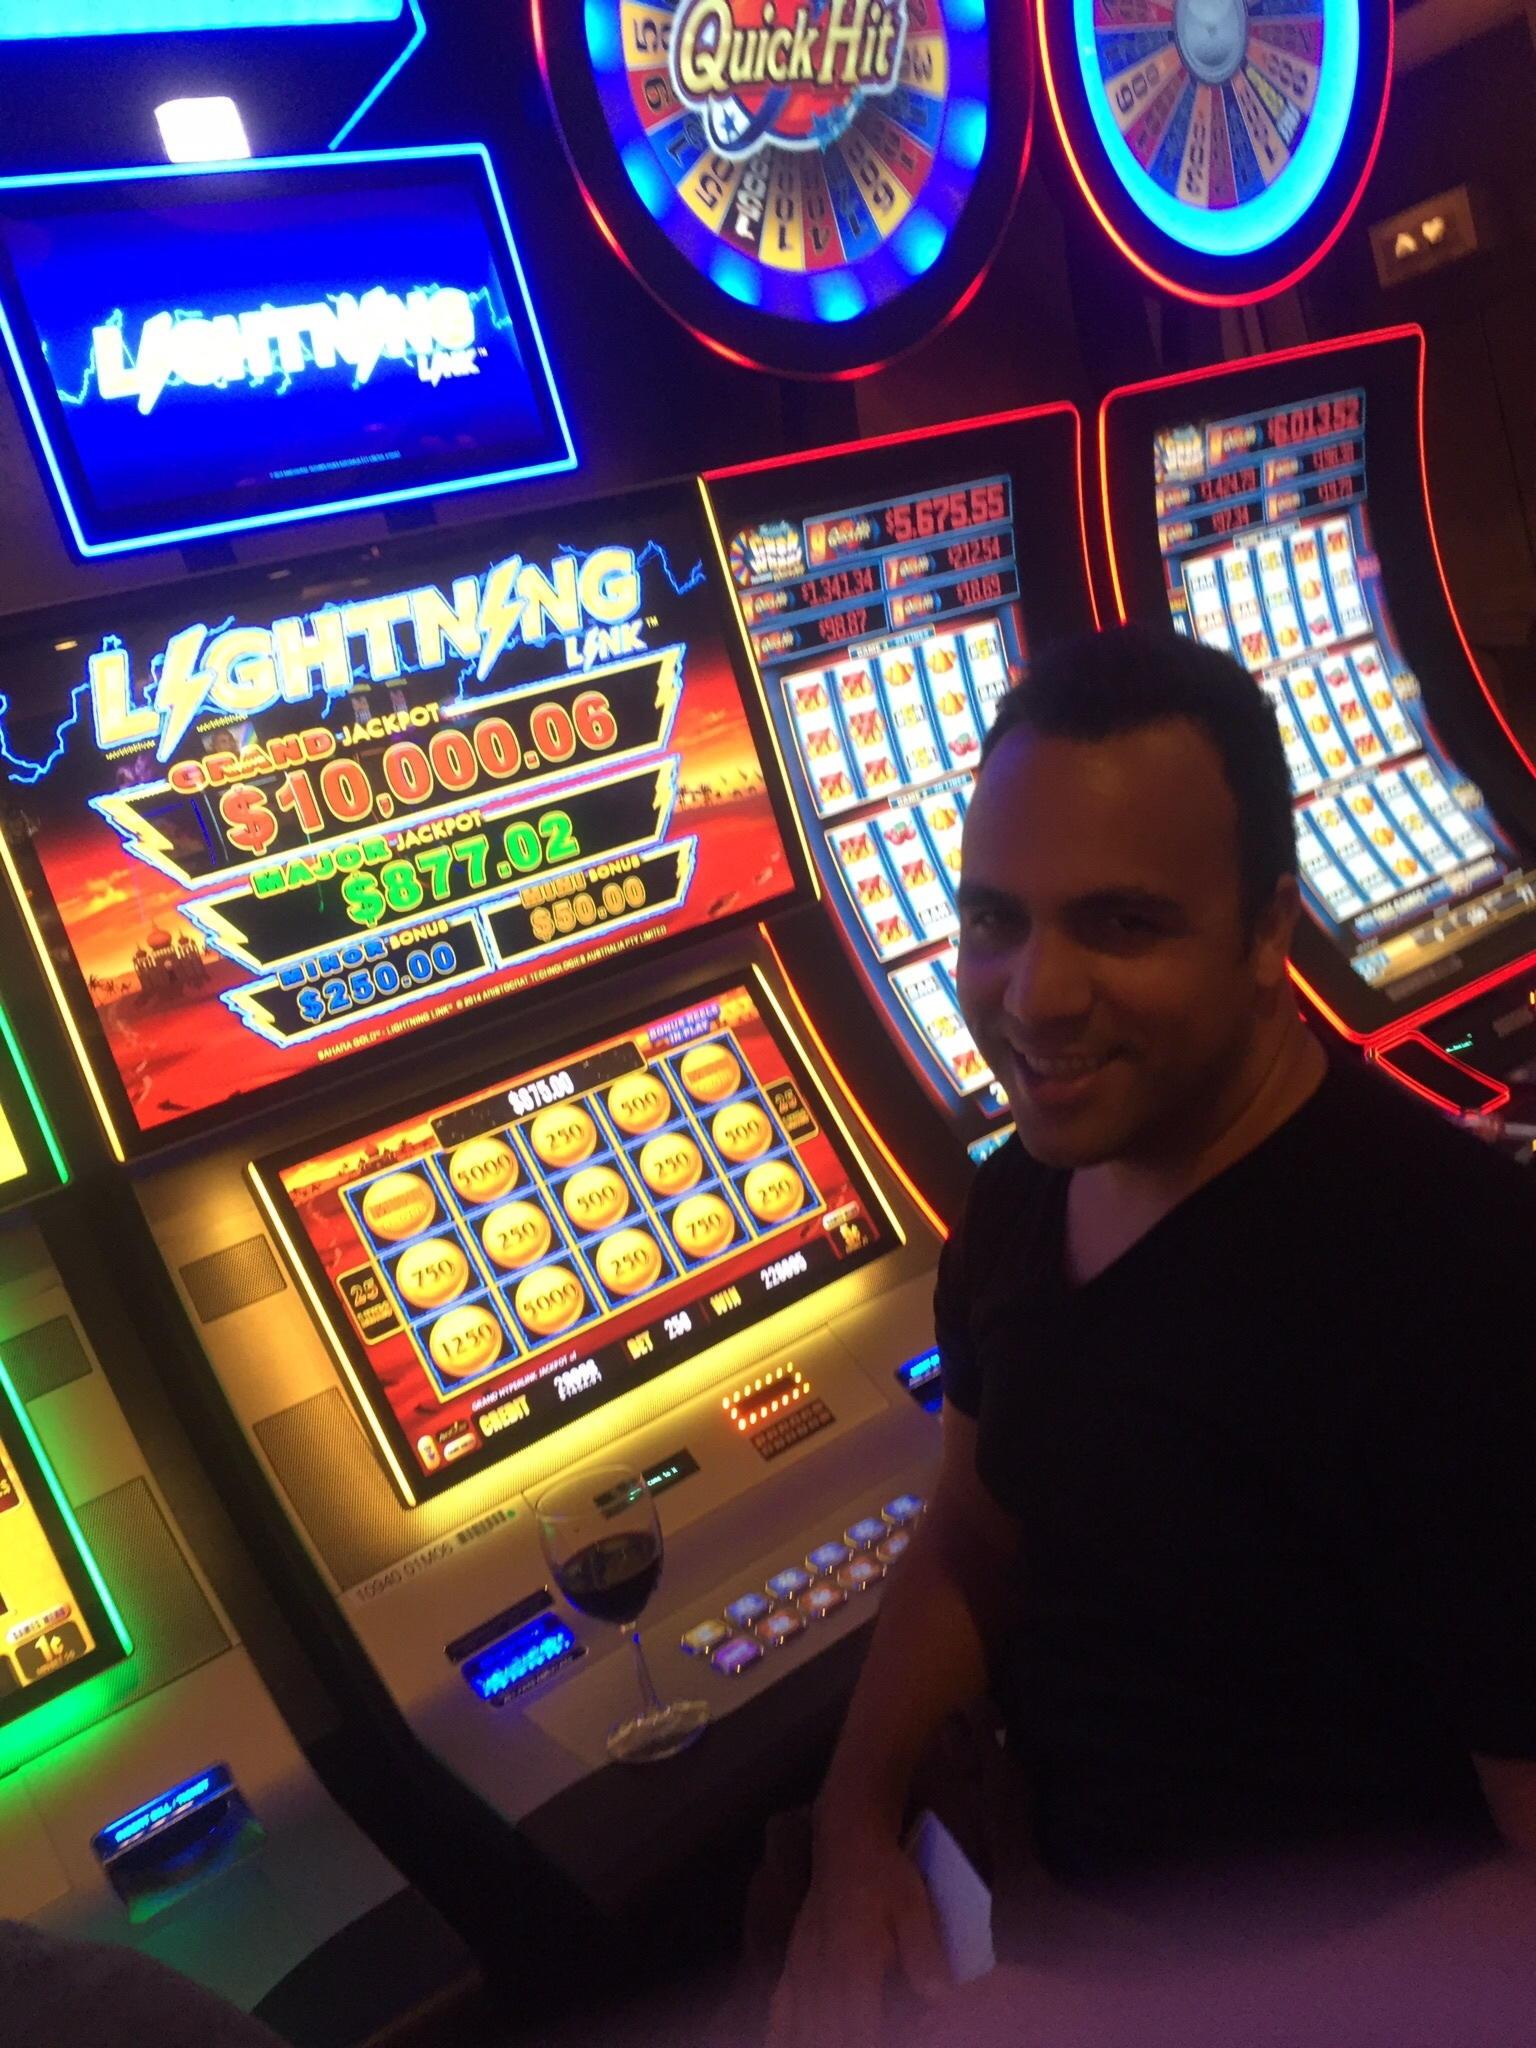 $3595 No deposit casino bonus at Slots 555